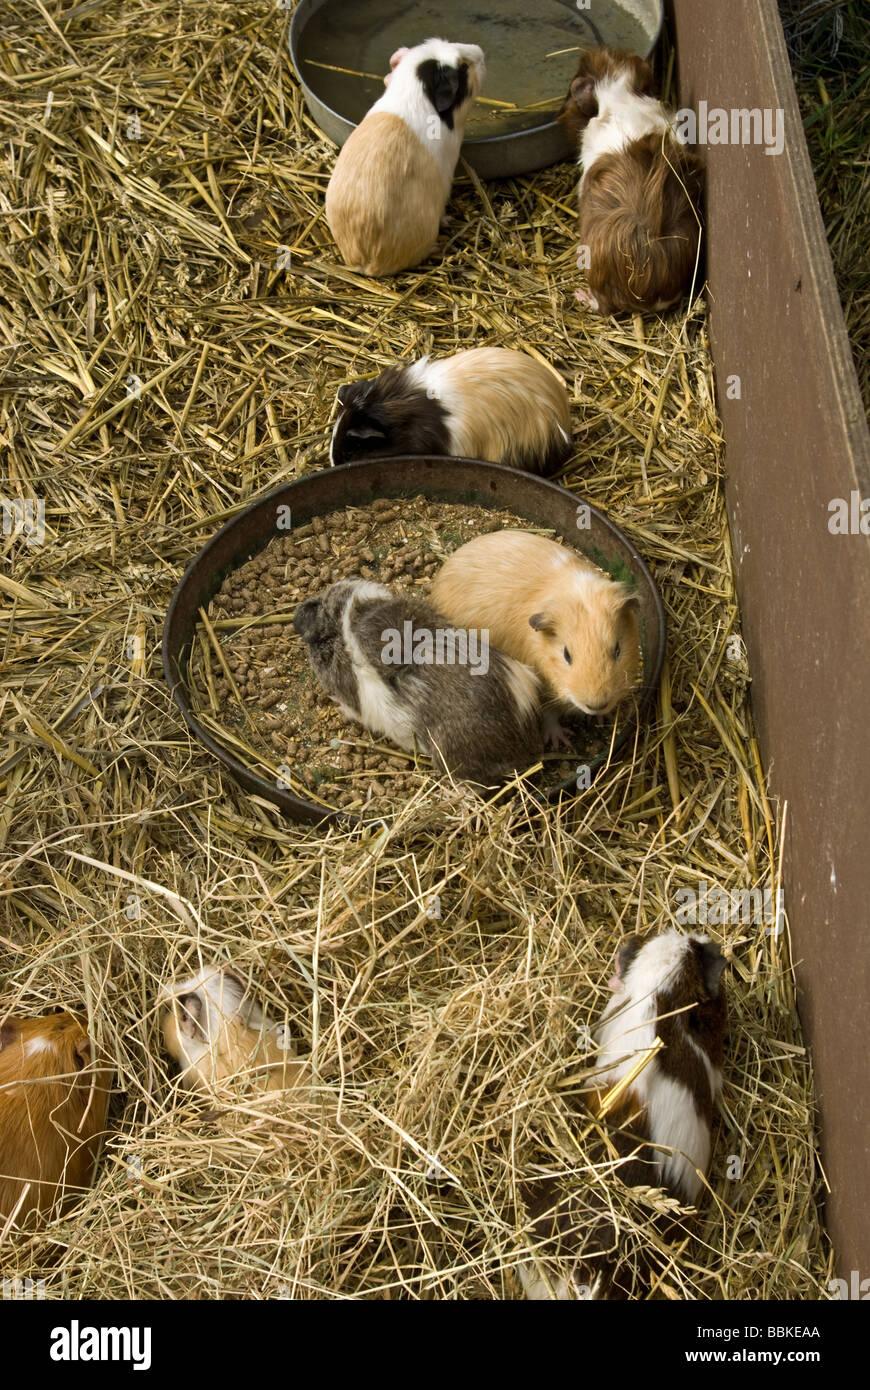 A family of Guinea Pigs enjoy feeding time - Stock Image